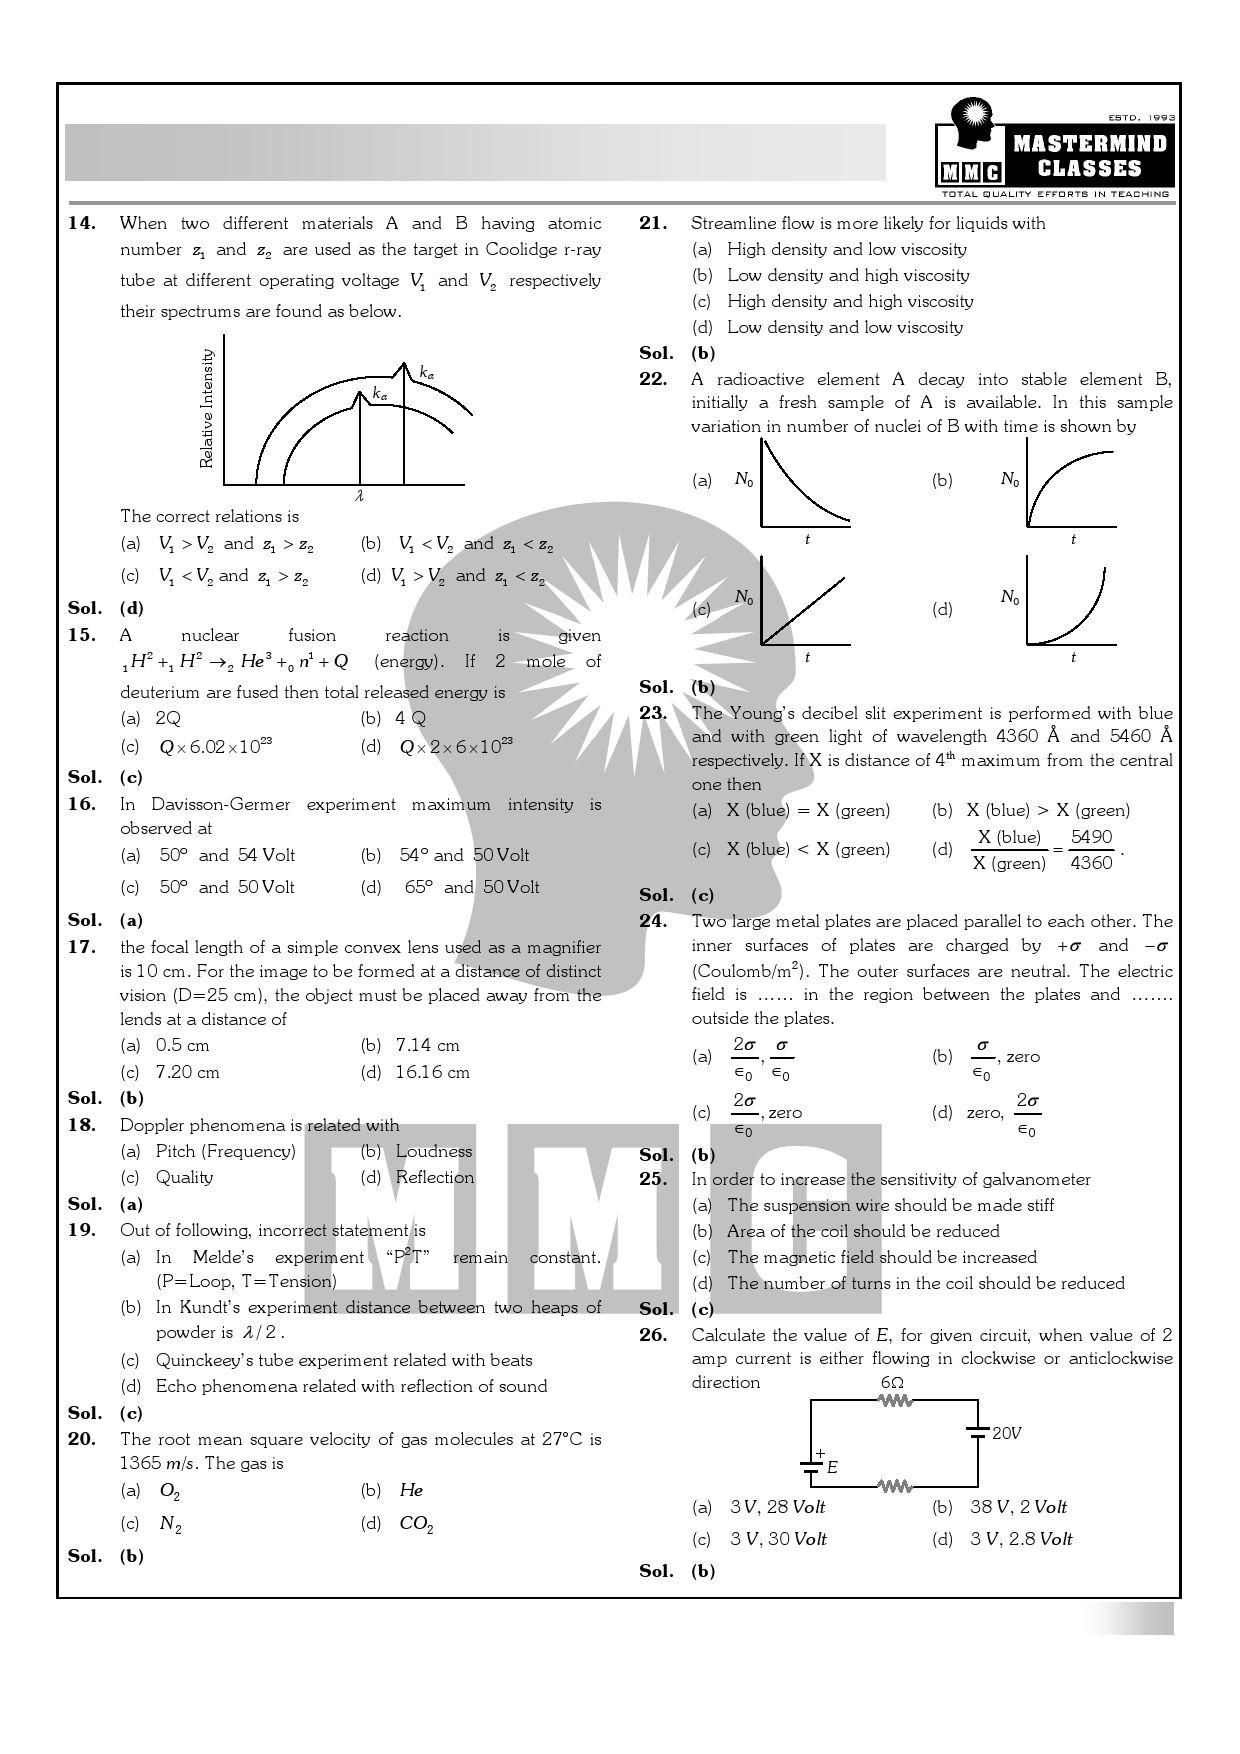 Asdf Hgfdsa By Dev Nagle Issuu 38v Wiring Diagram